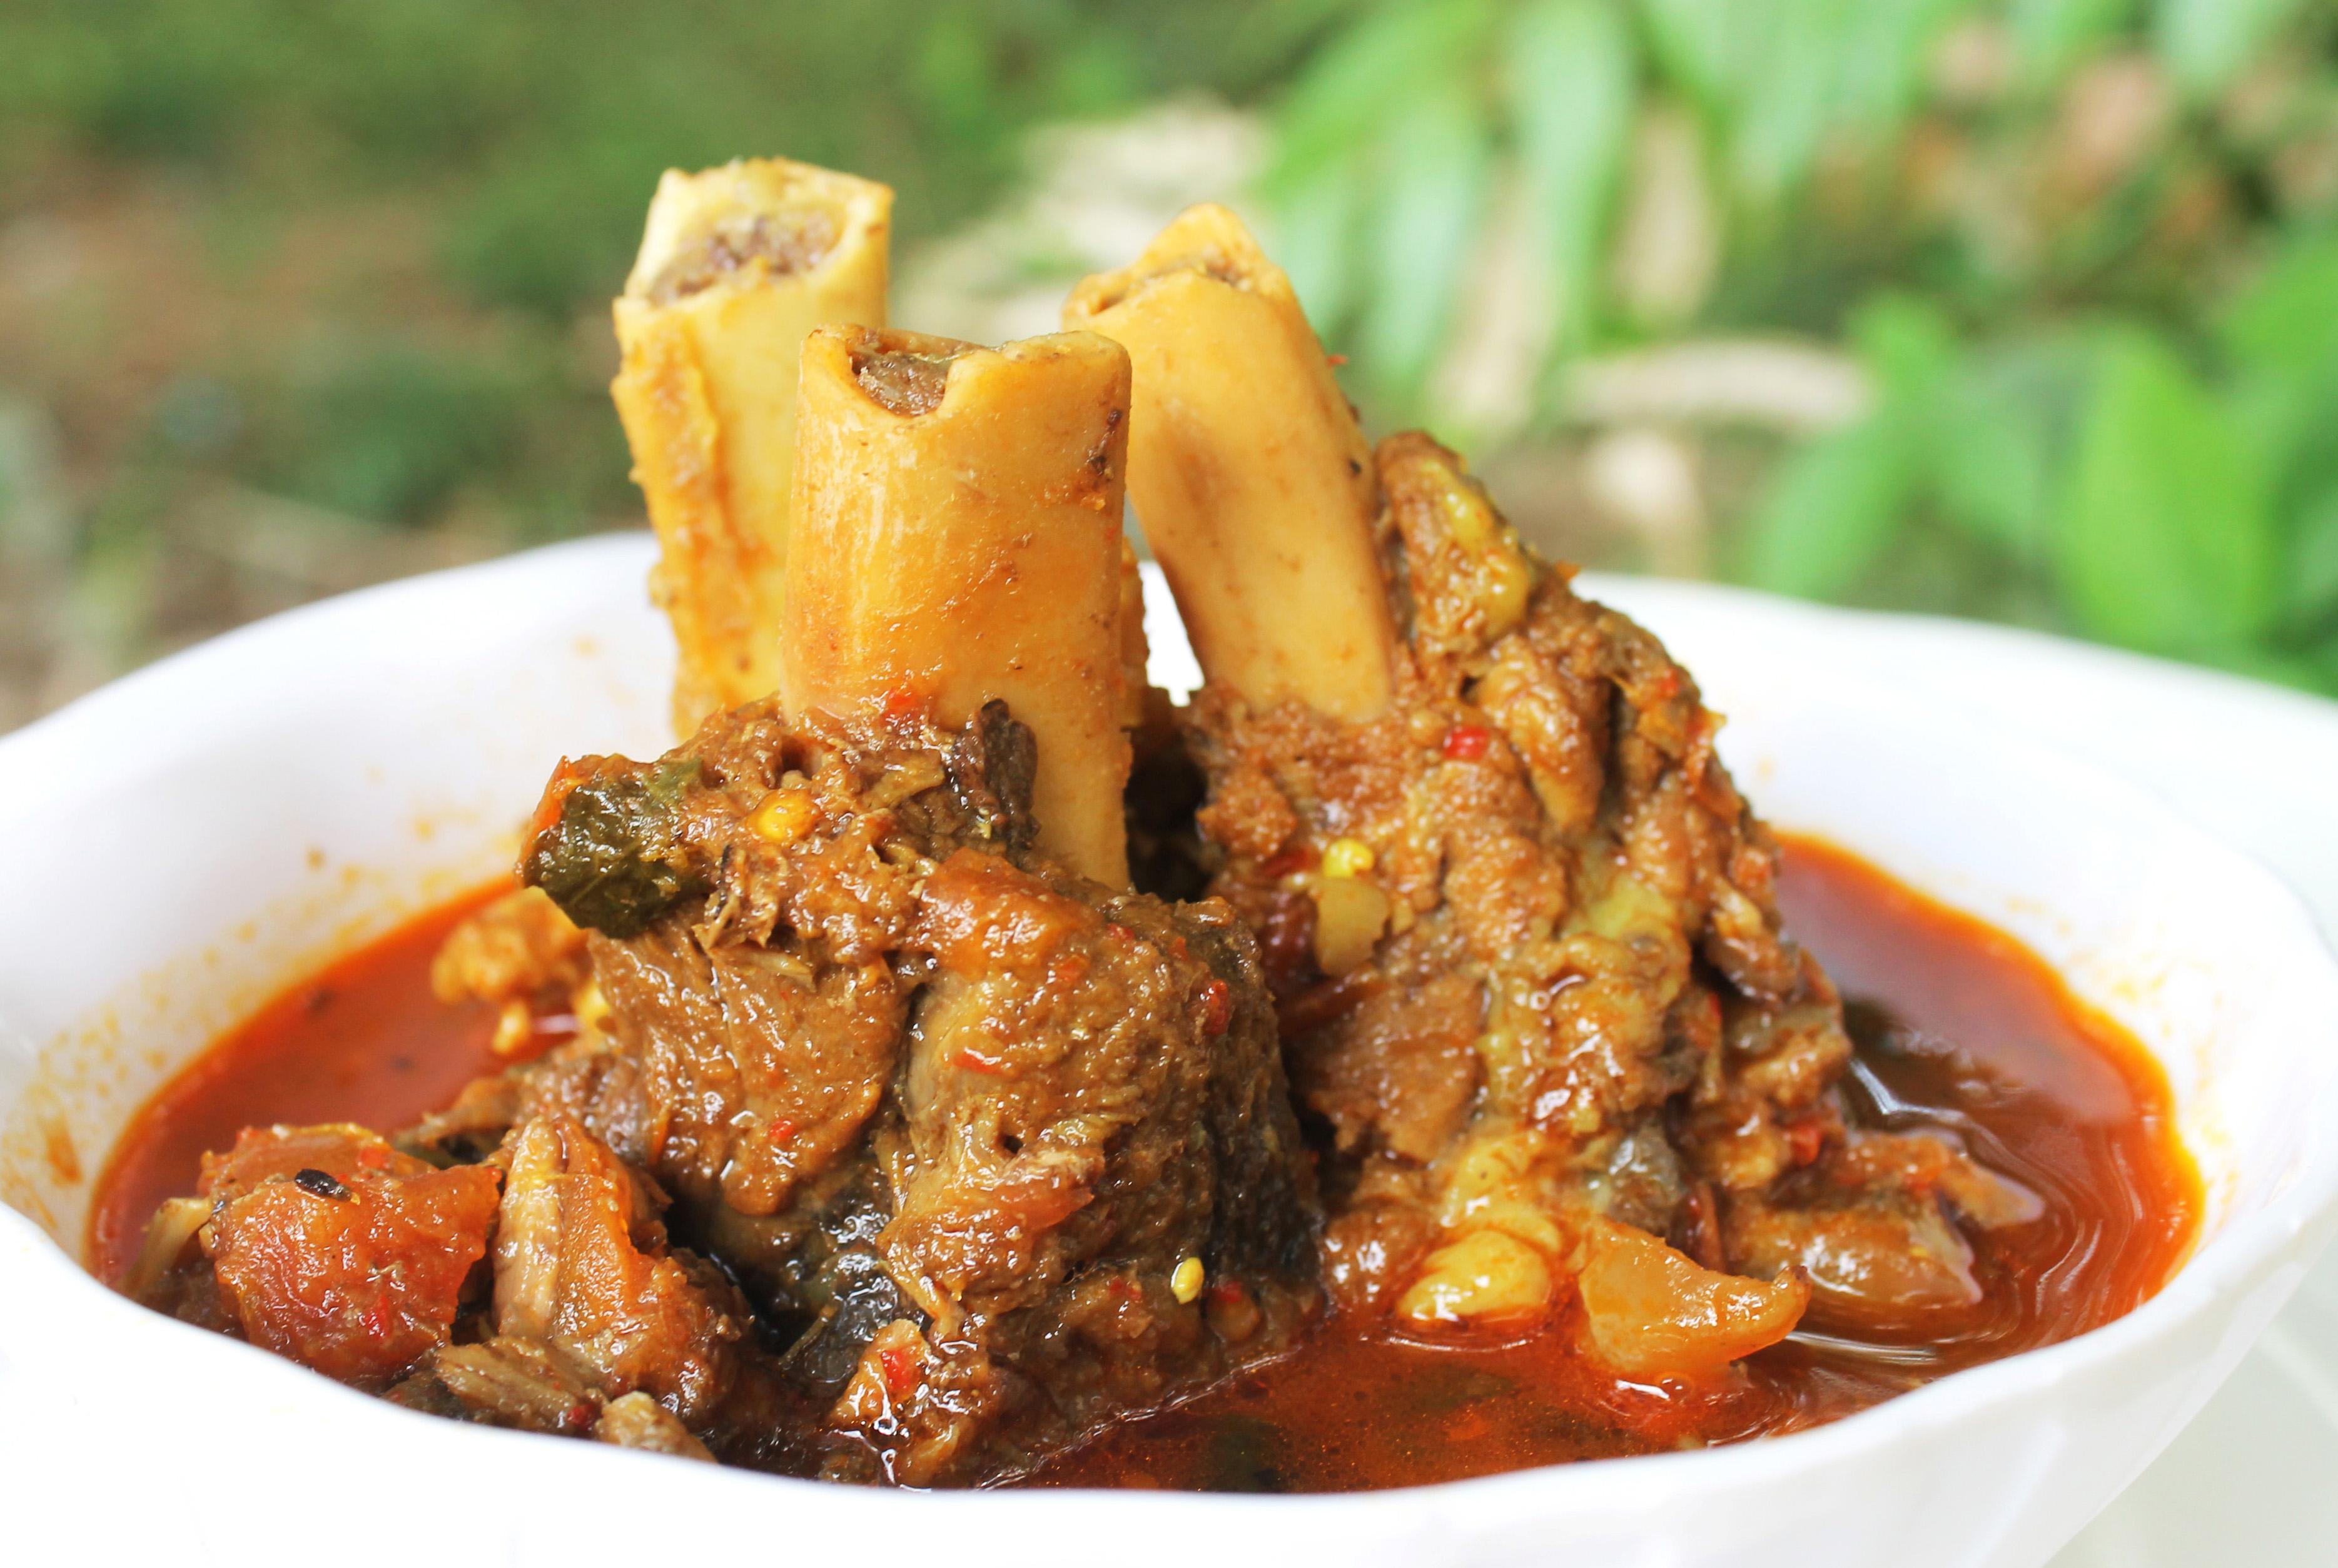 resep daging kambing aneka resep menu masakan daging kambing